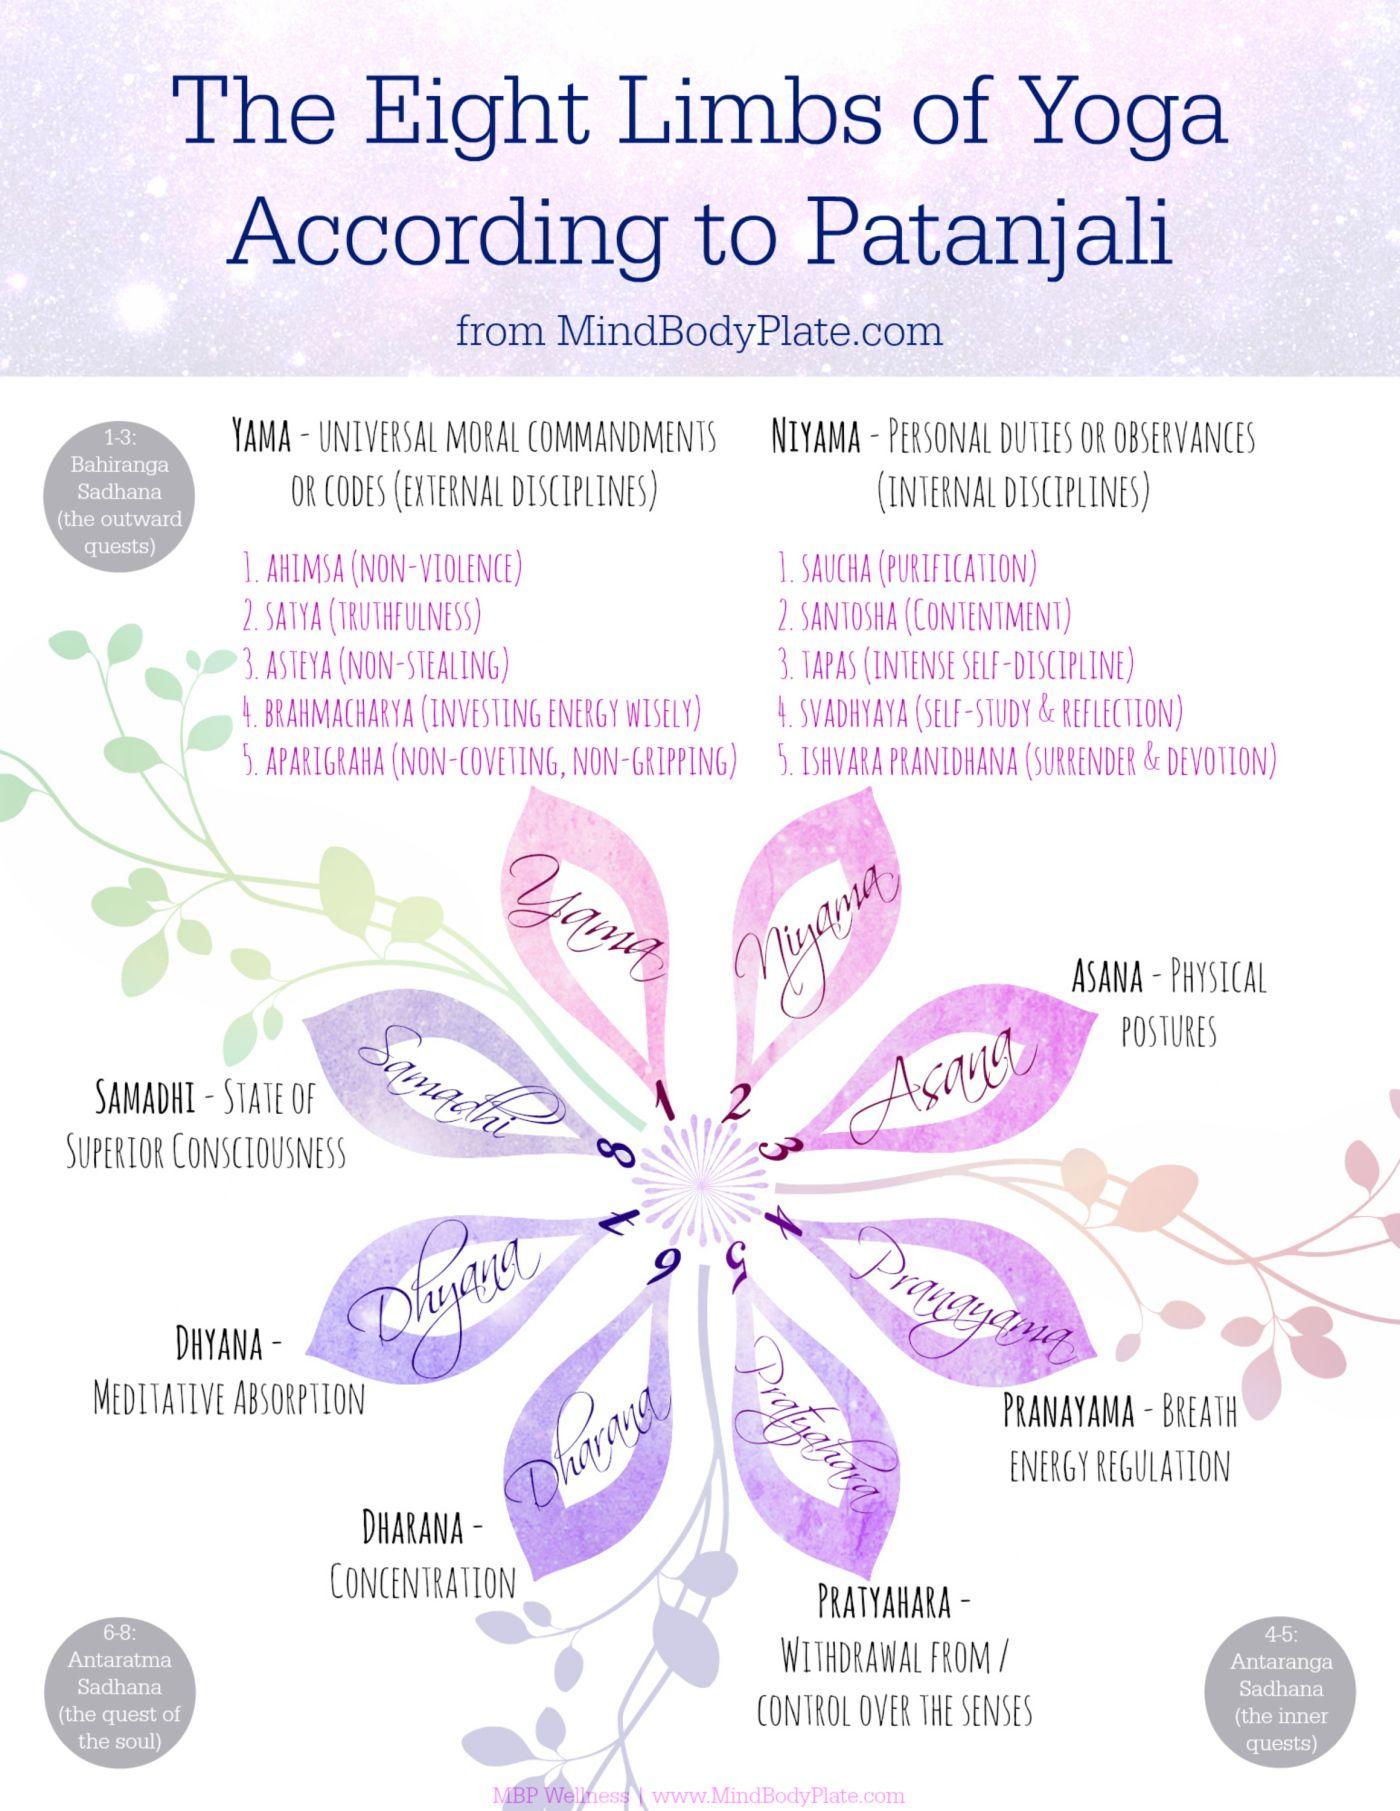 Patanjali's eight limbs of yoga | 8 Limbs | from www.MindBodyPlate.com | yama, niyama, asana, pranayama, pratyahara, dharana, dhyana, samadhi <3